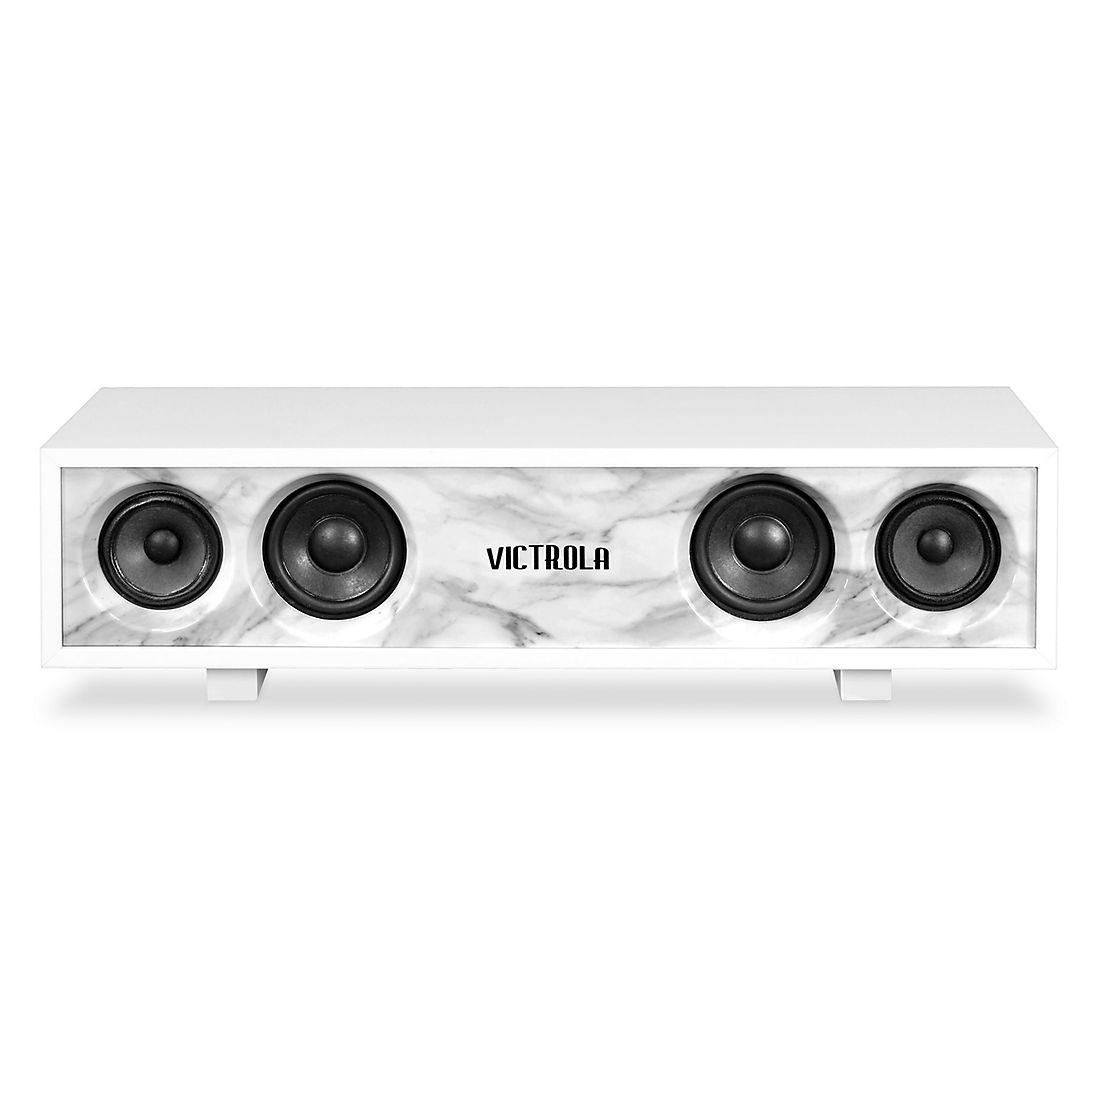 Victrola Hi-Fi Bluetooth Speaker - White